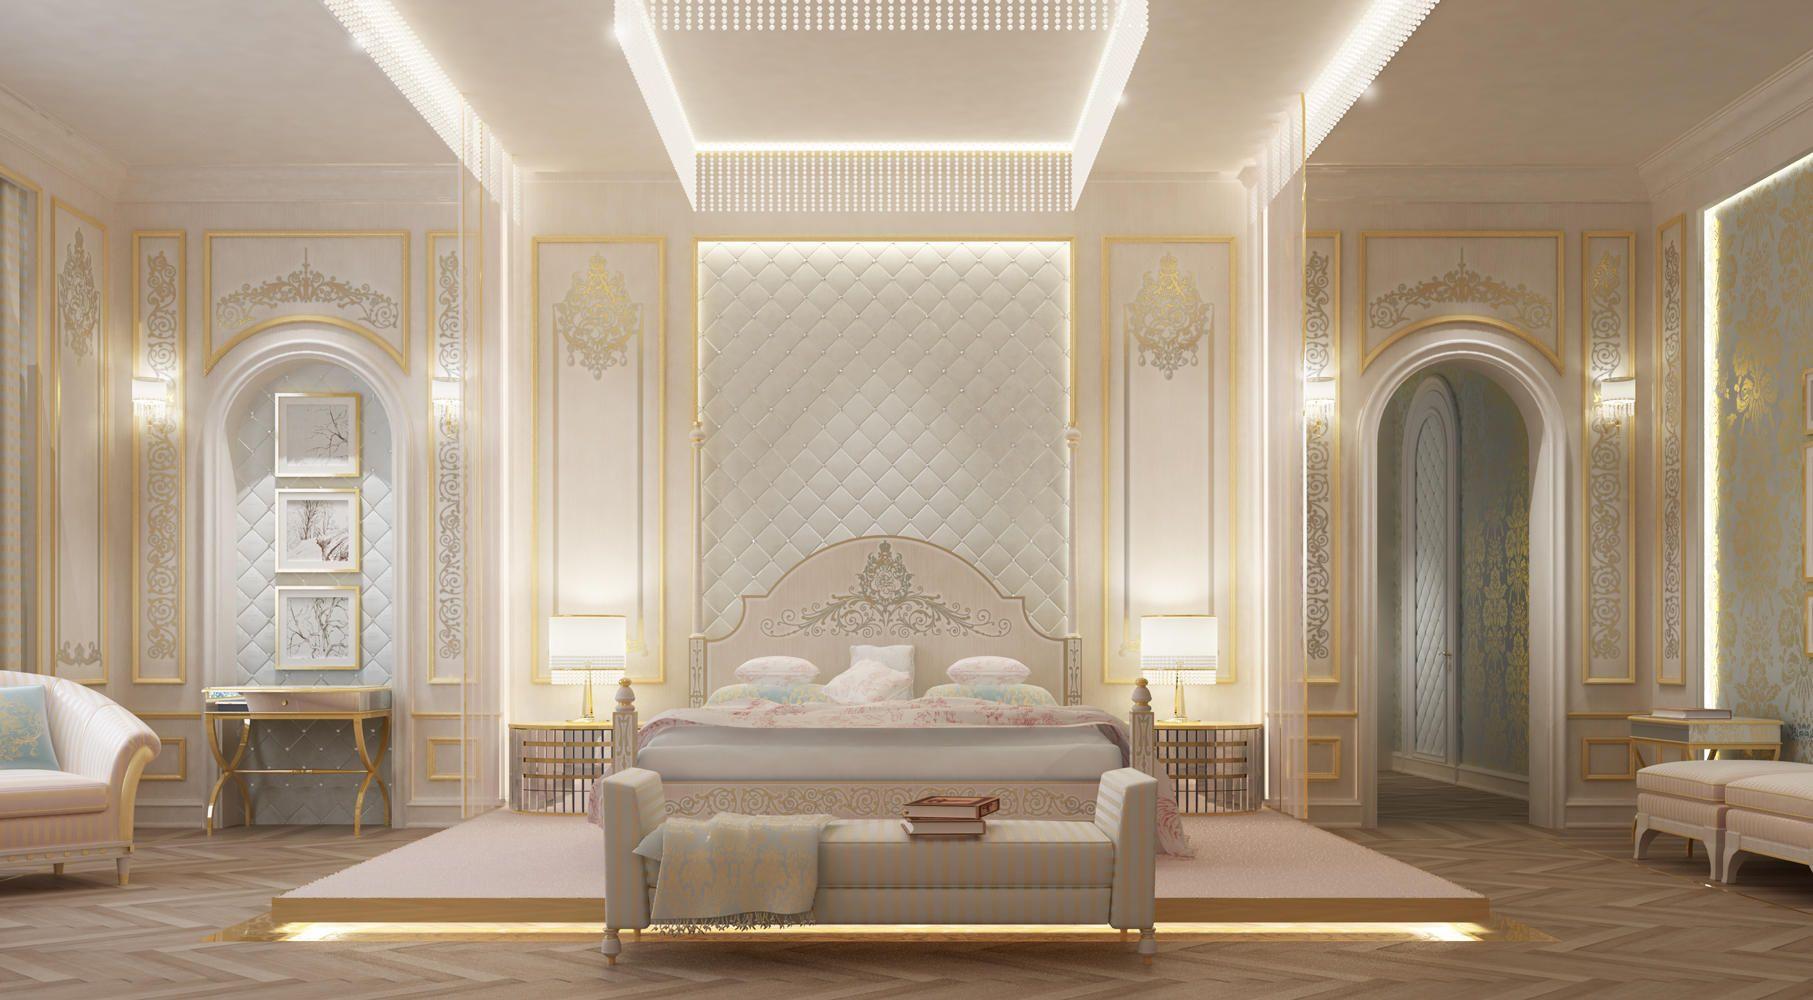 Arabic Bedroom Design Entrancing Arab Palaces  Buscar Con Google  Classicrooms  Pinterest Decorating Inspiration